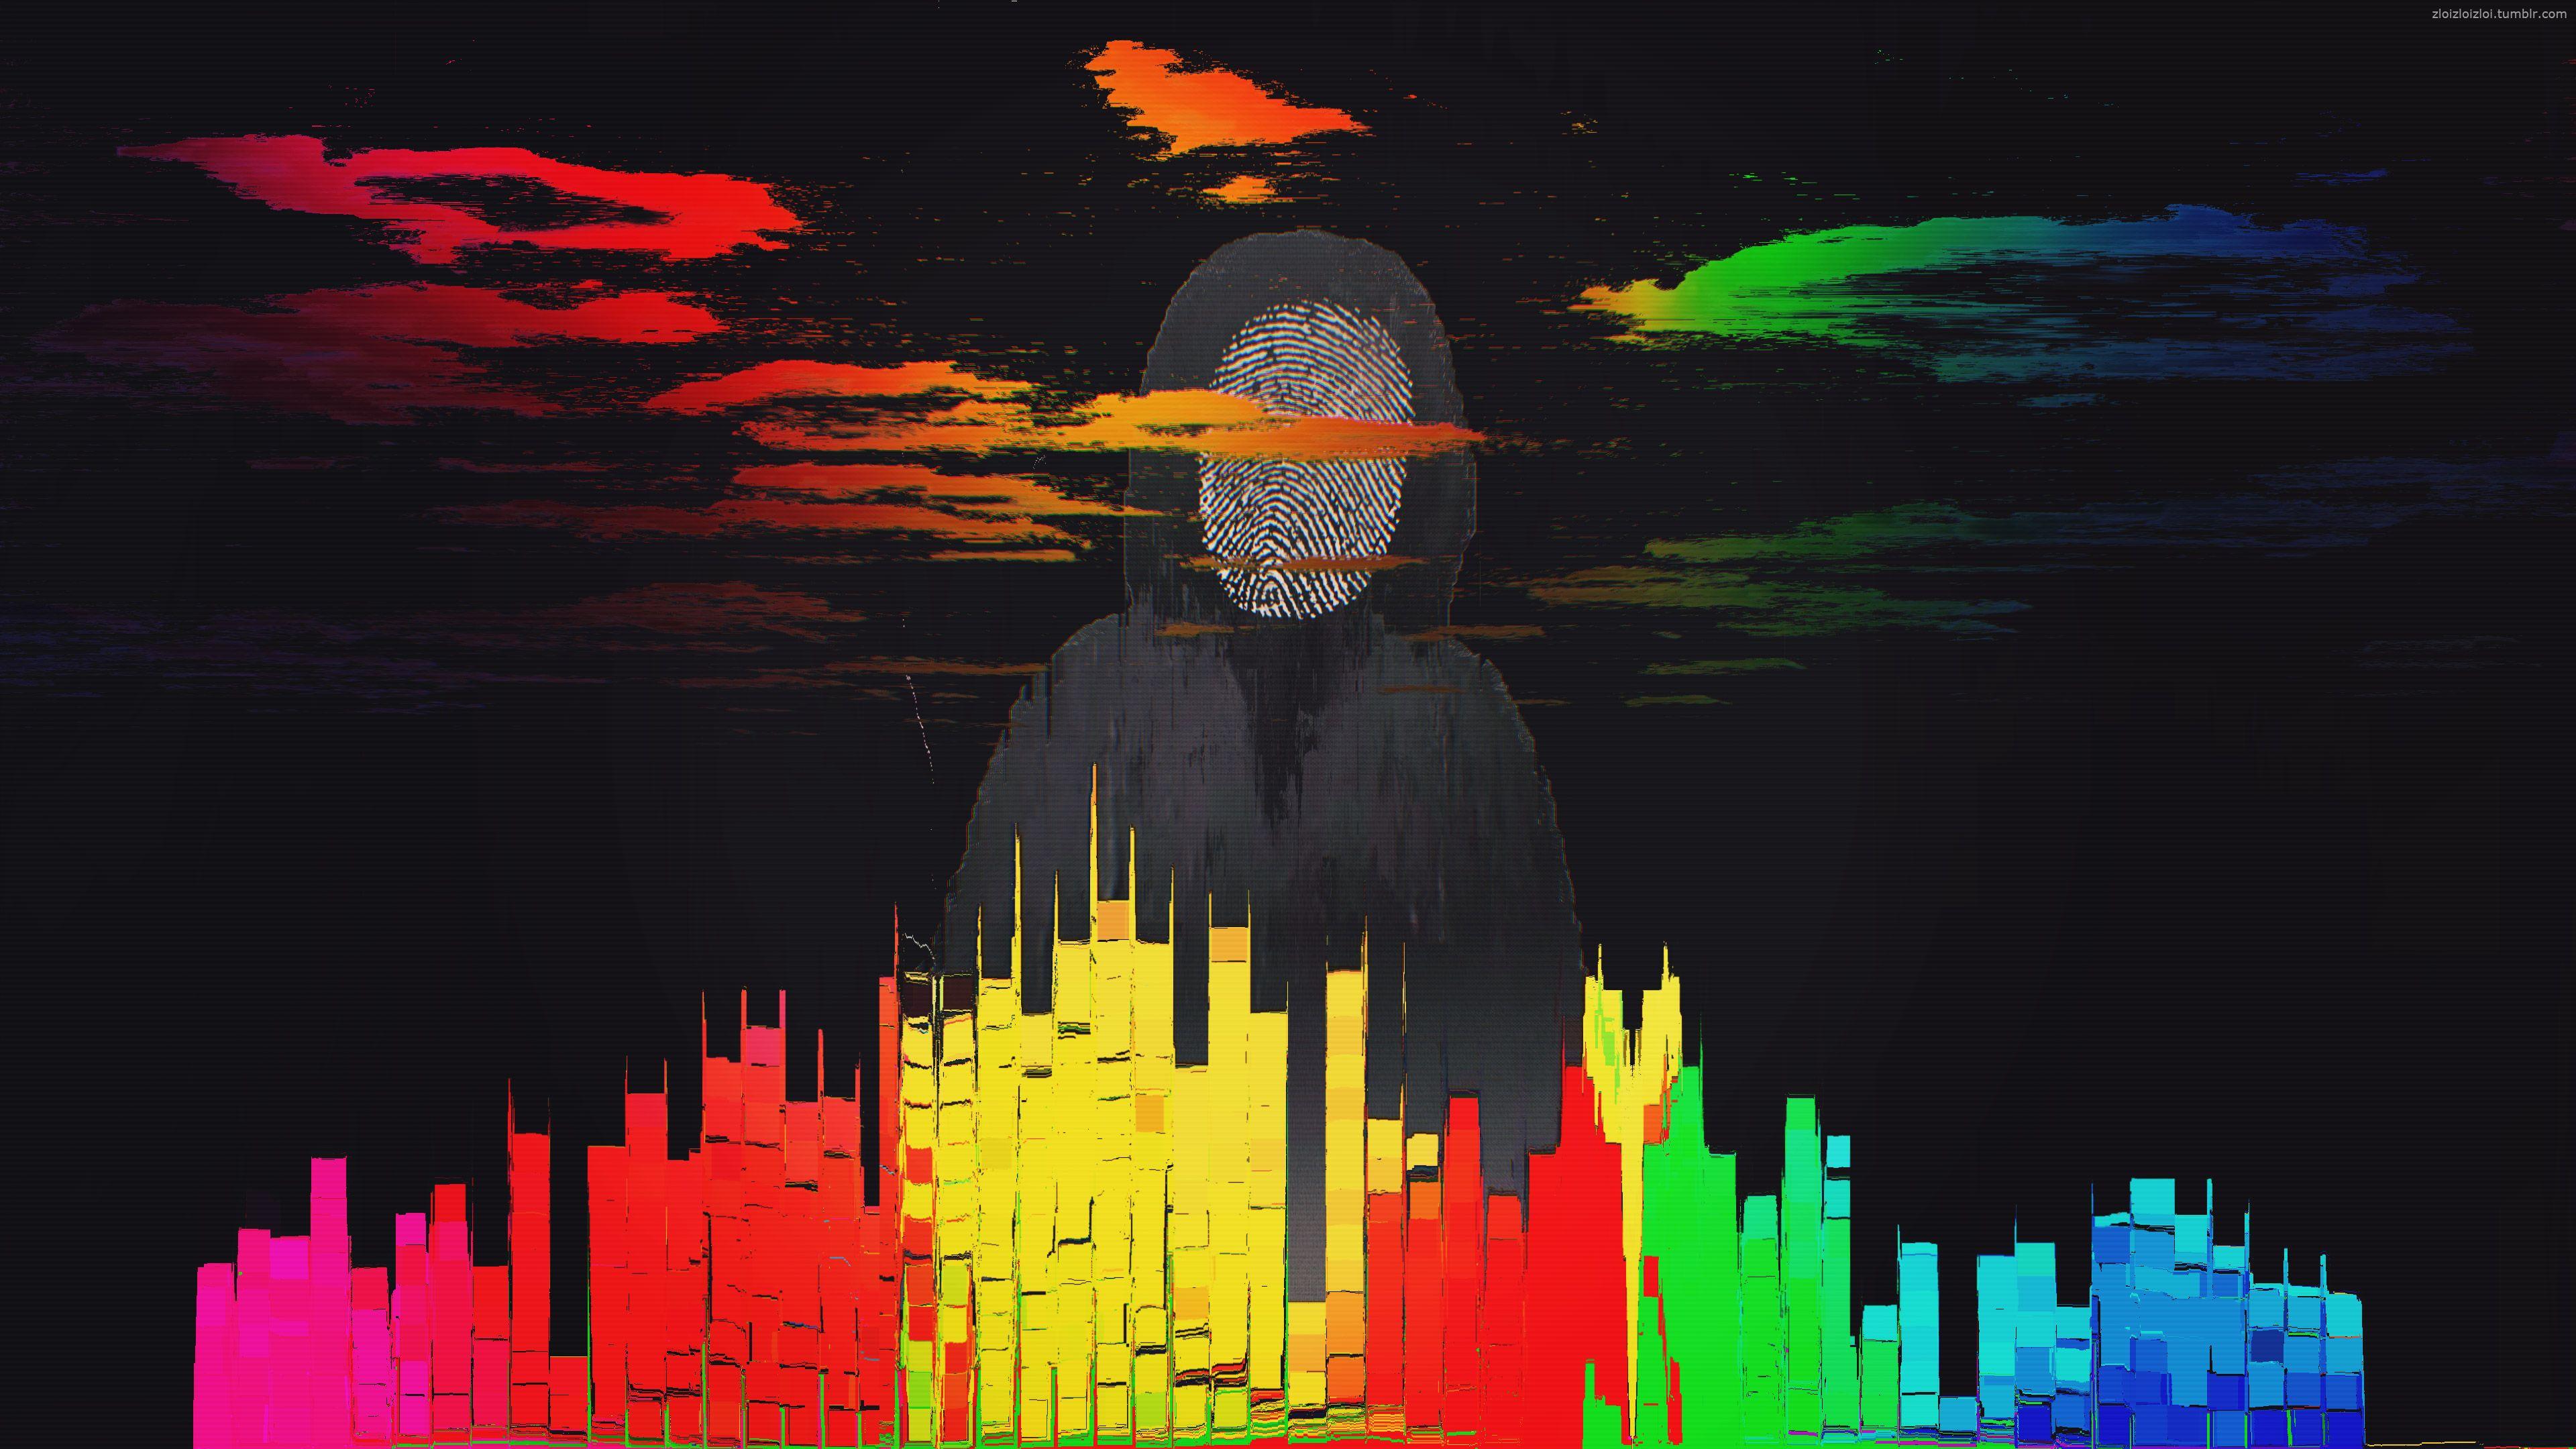 Glitch Art Abstract City Fingerprint 4k Glitch Art Abstract